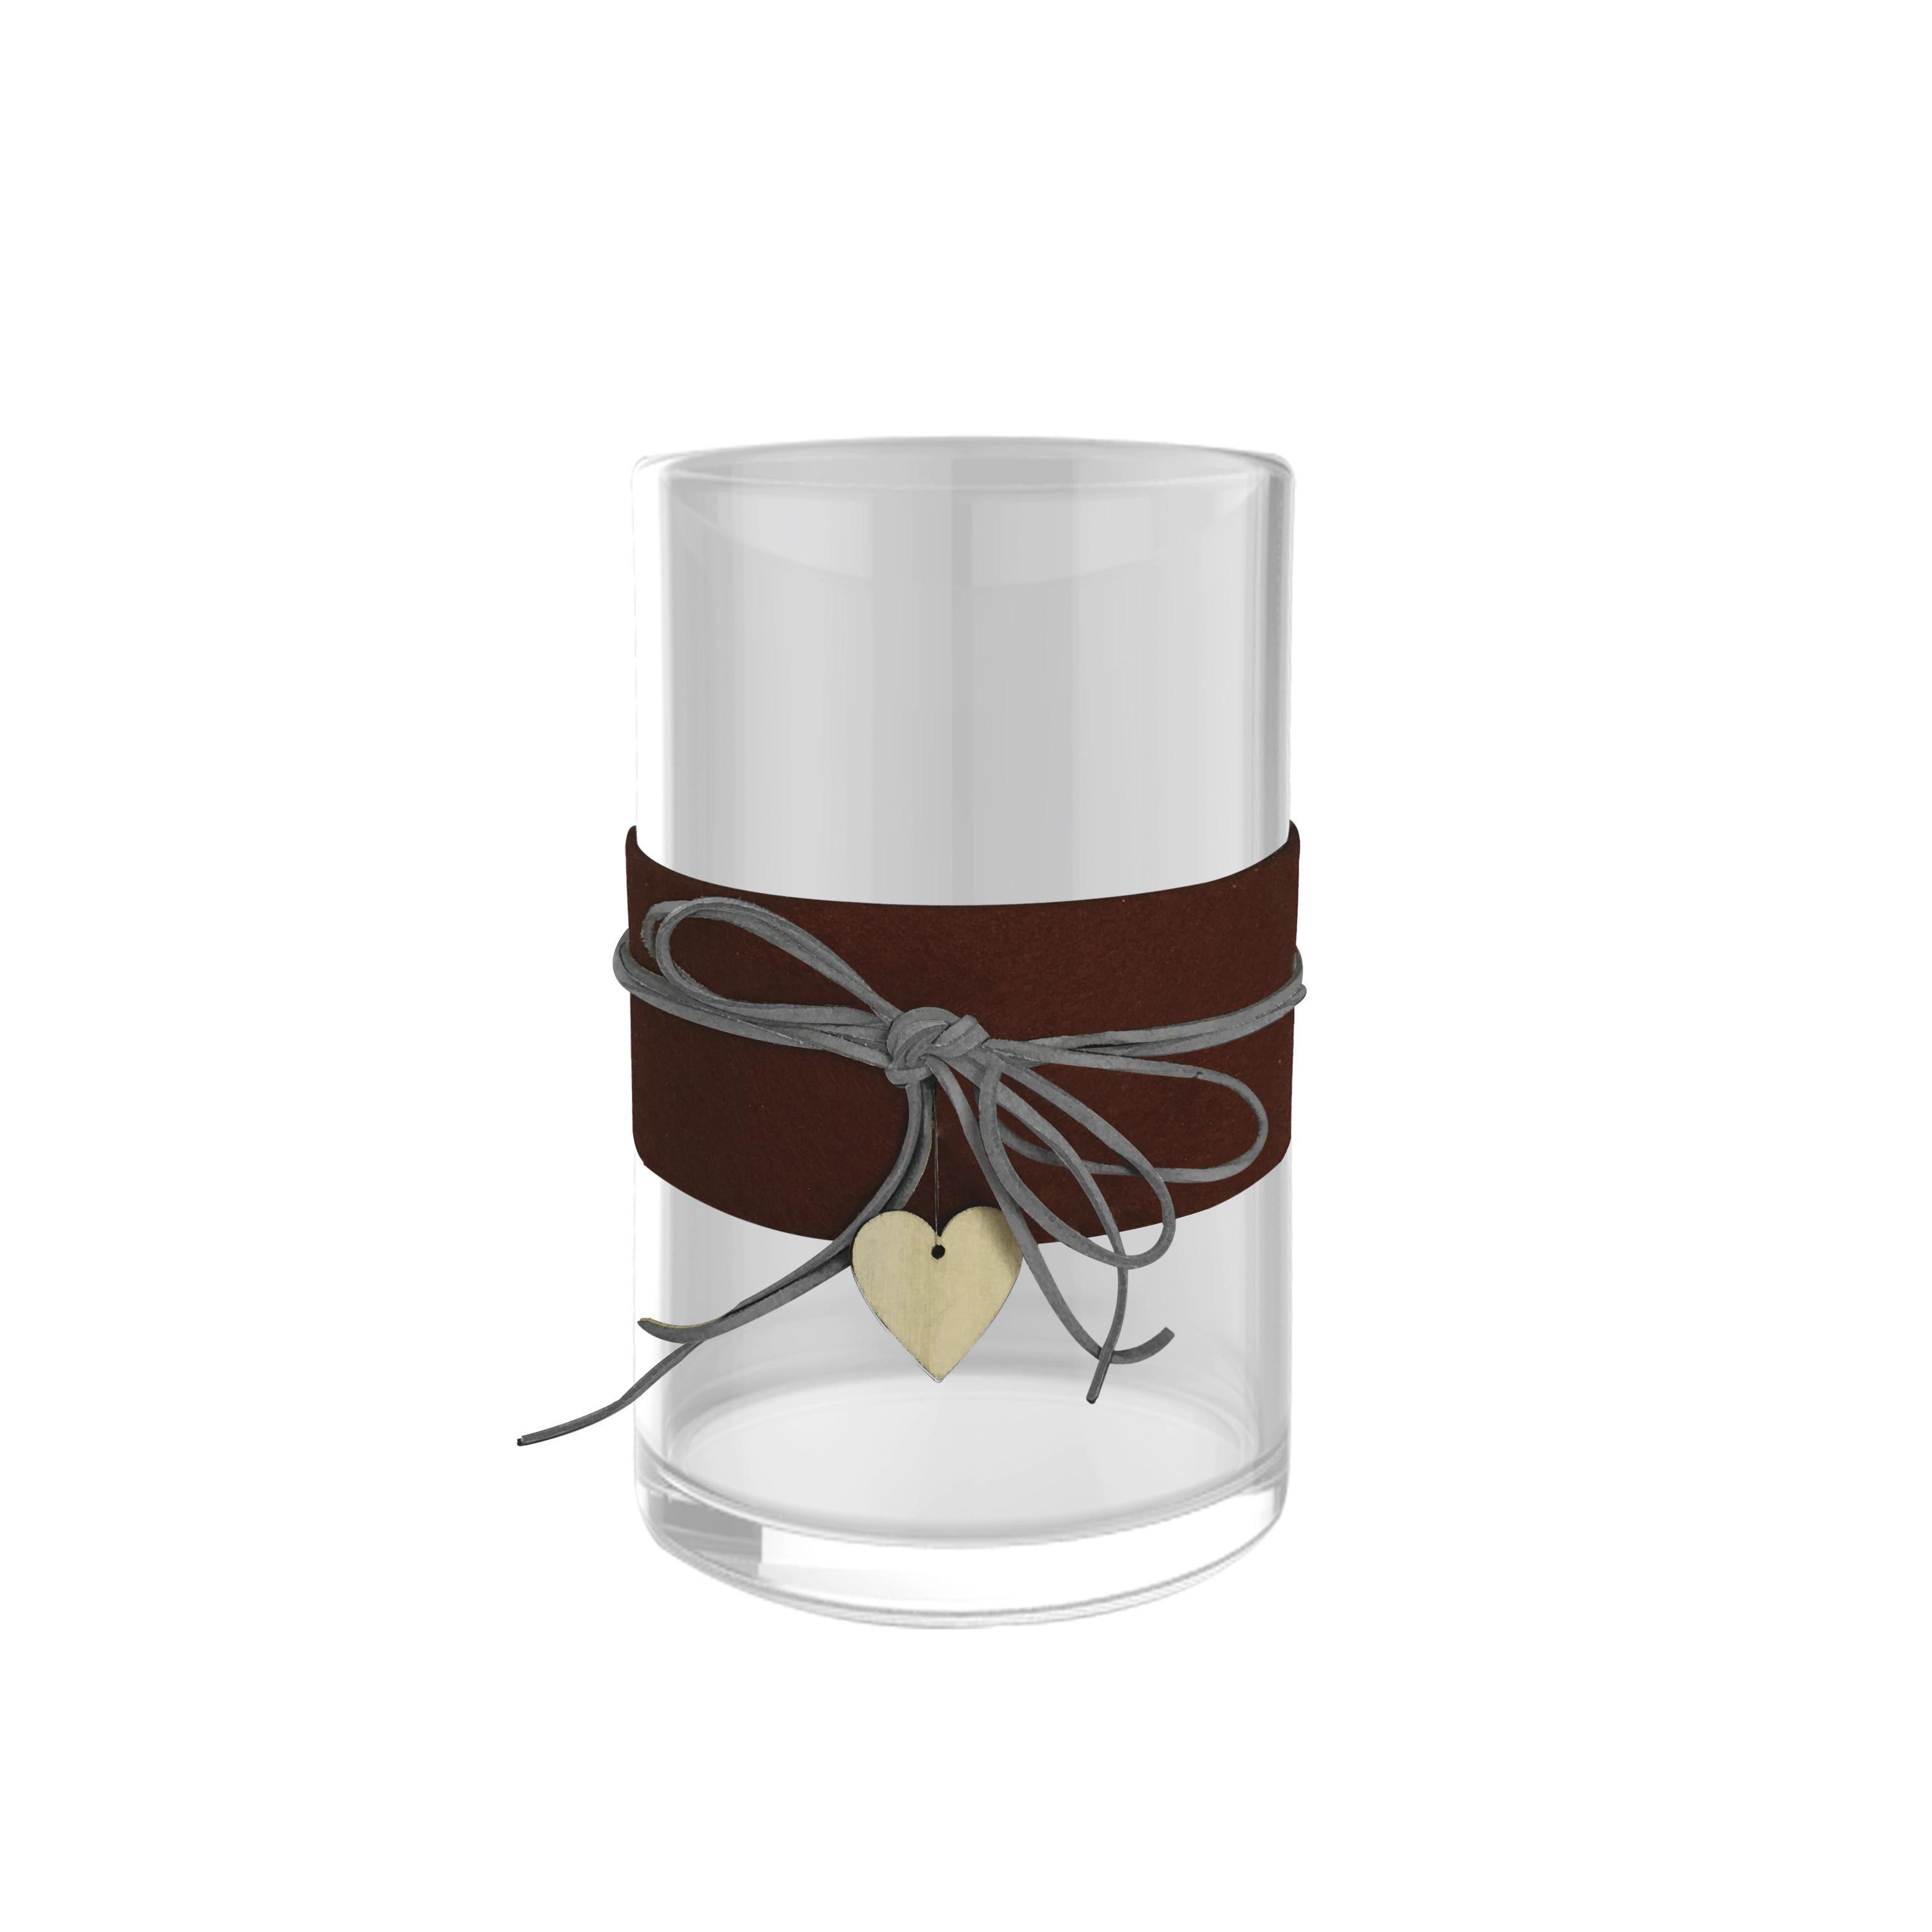 LJUSLYKTA - klar/beige, Basics, glas/textil (10,4/13,3cm) - Ambia Home